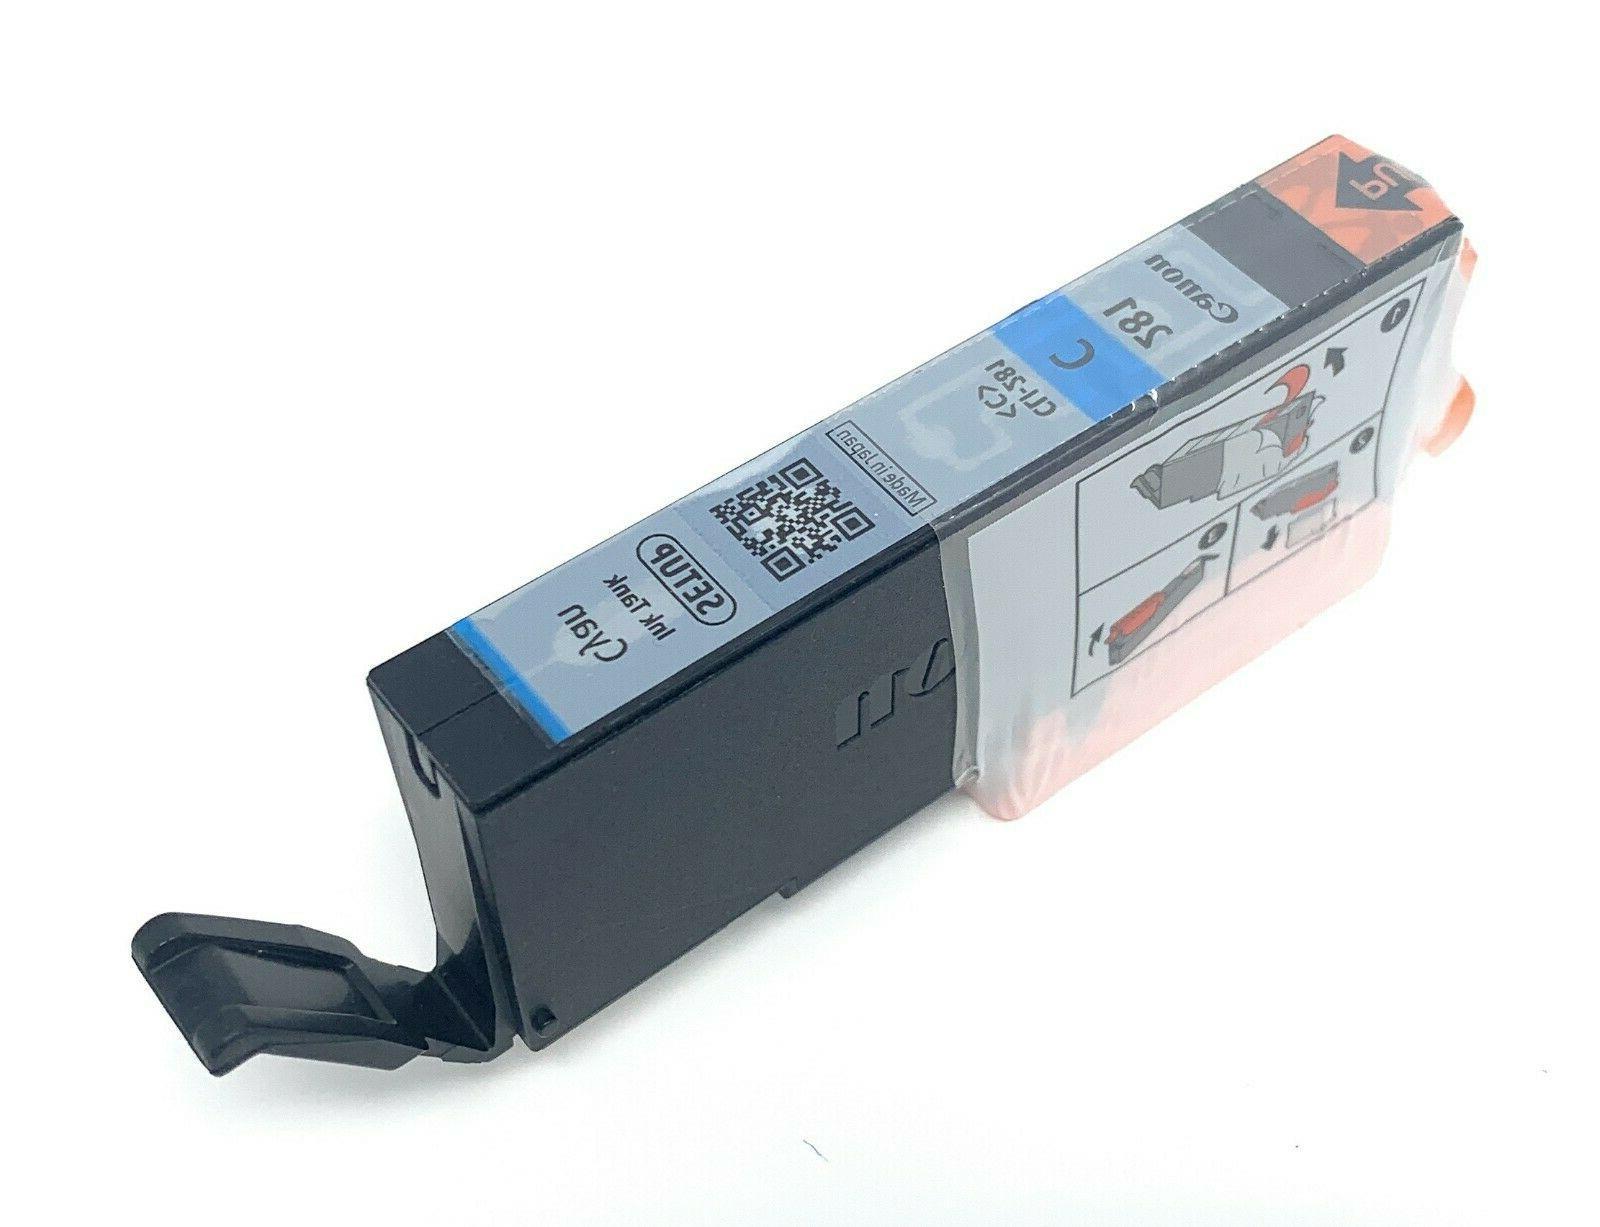 Canon Genuine PGI-280 & Colors PGI/CLI Black